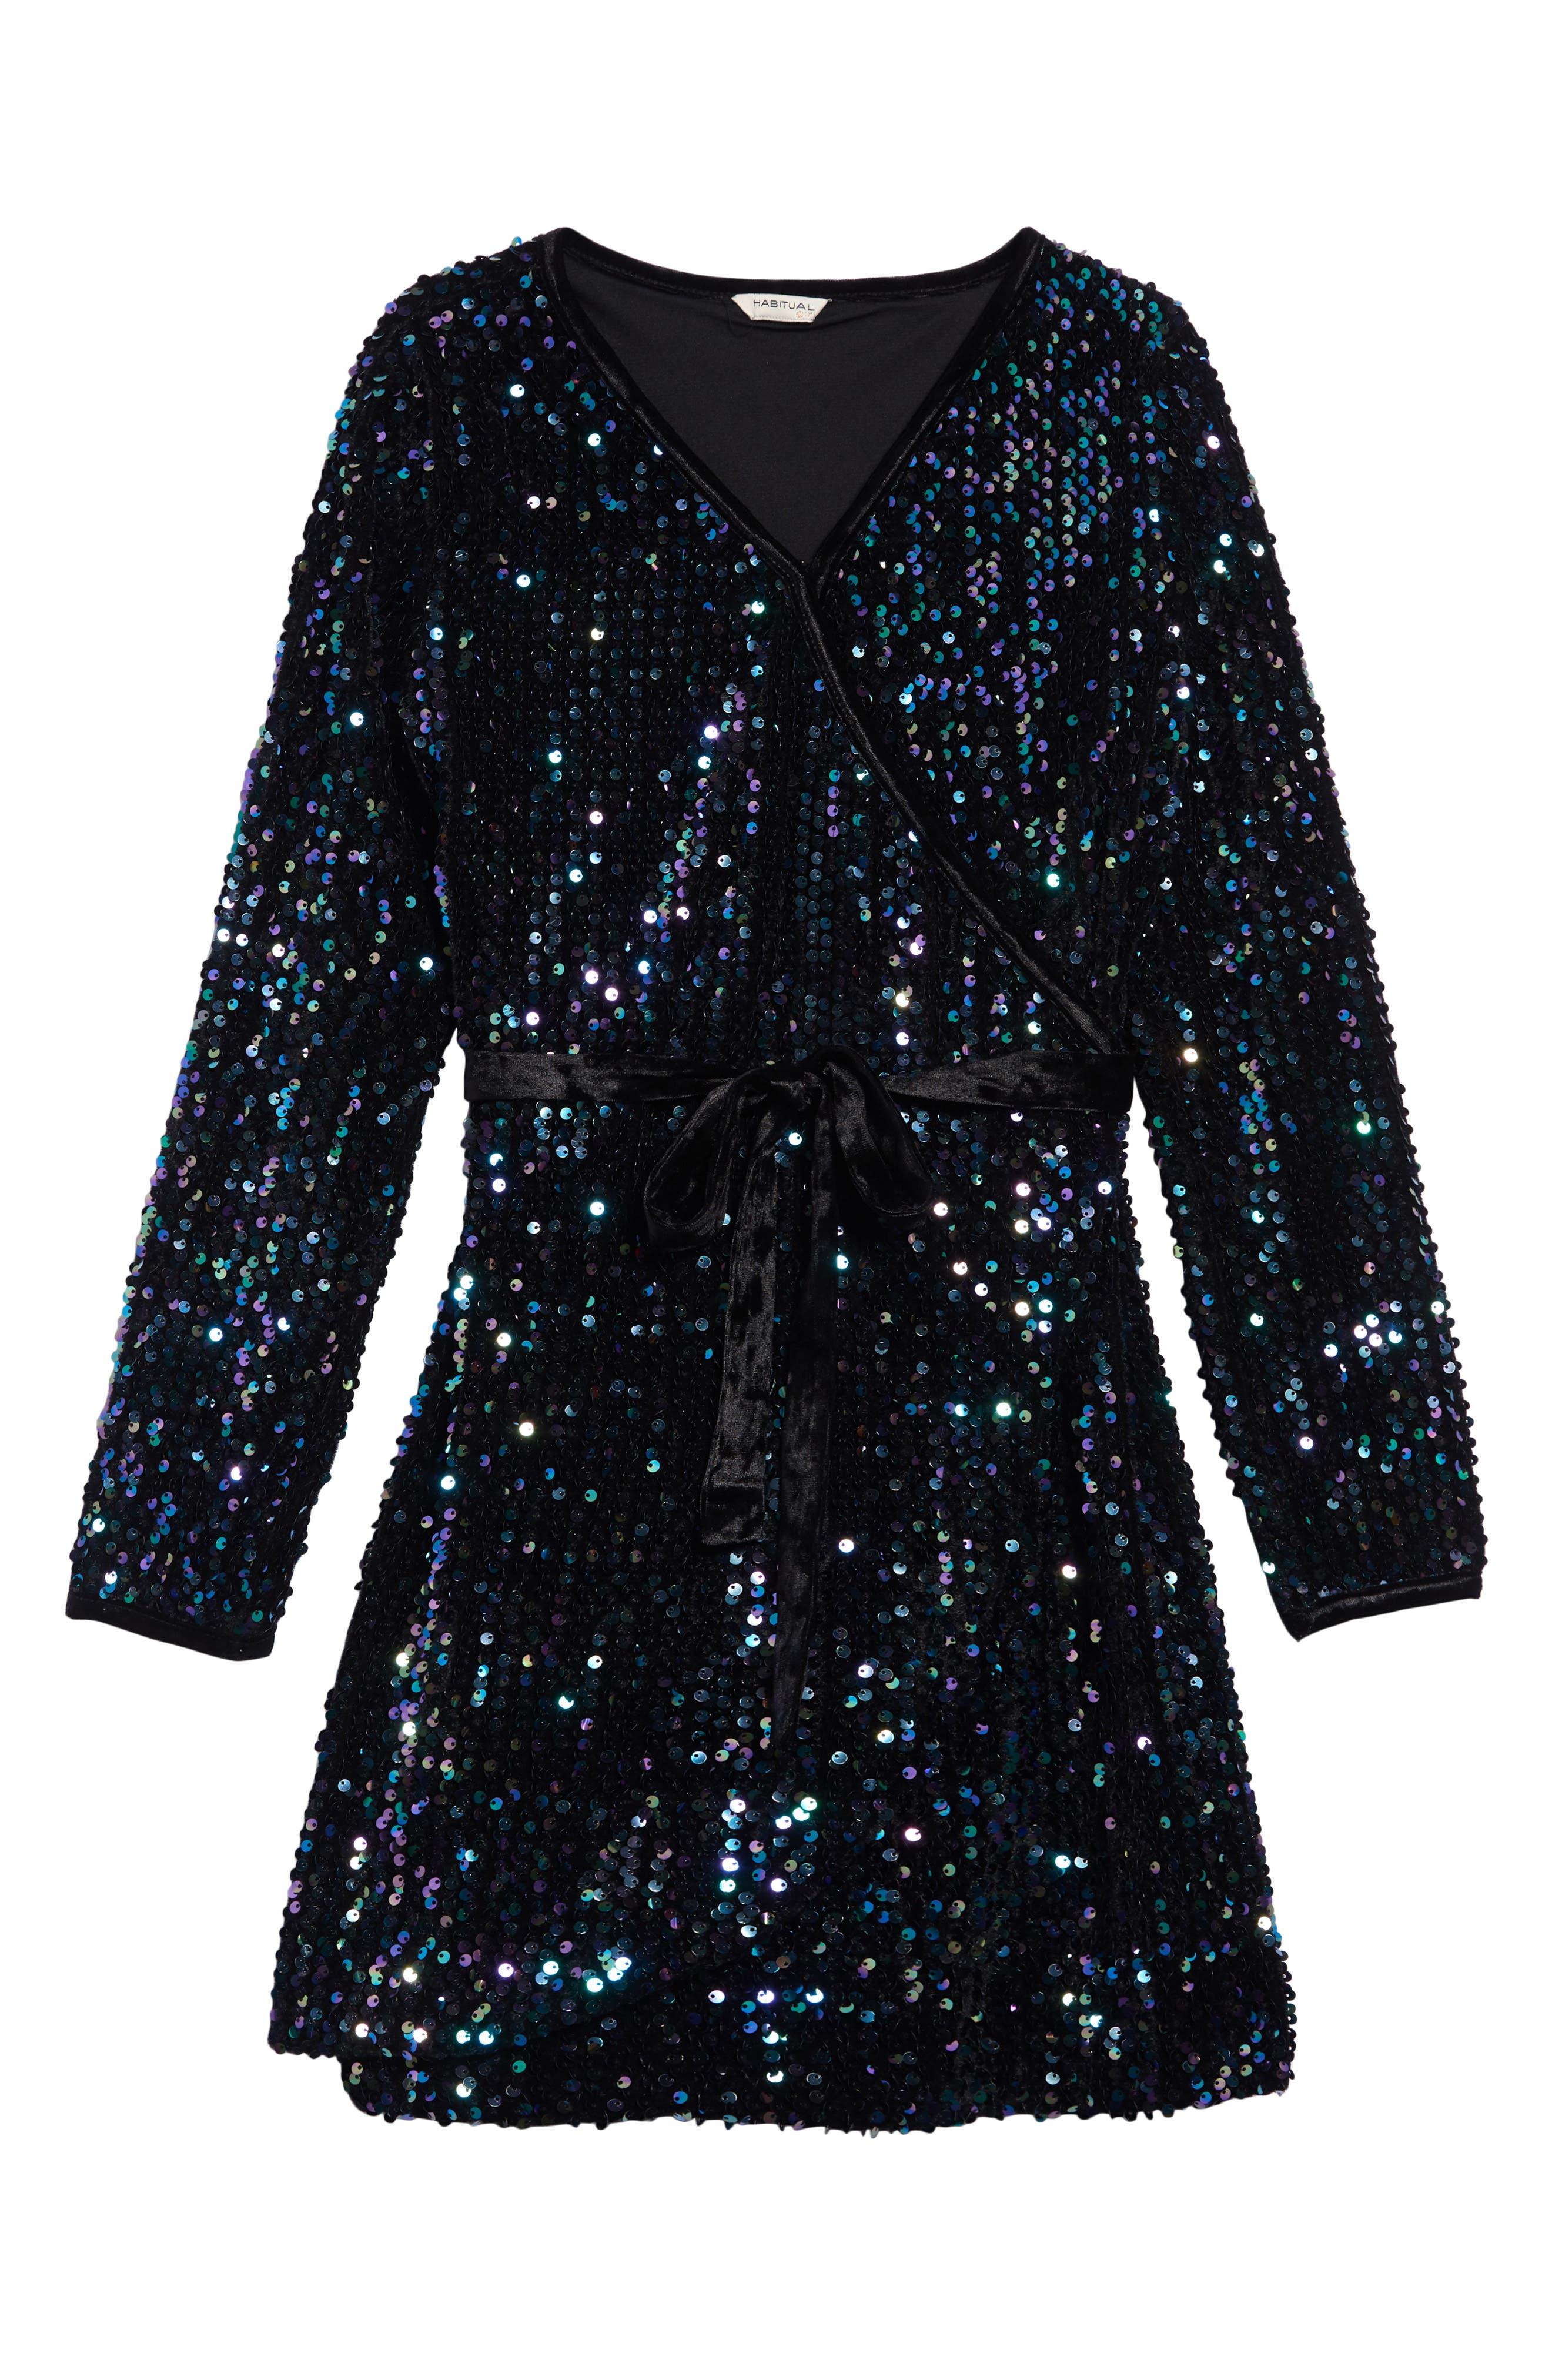 Image of Habitual Kids Raven Sequin Wrap Dress